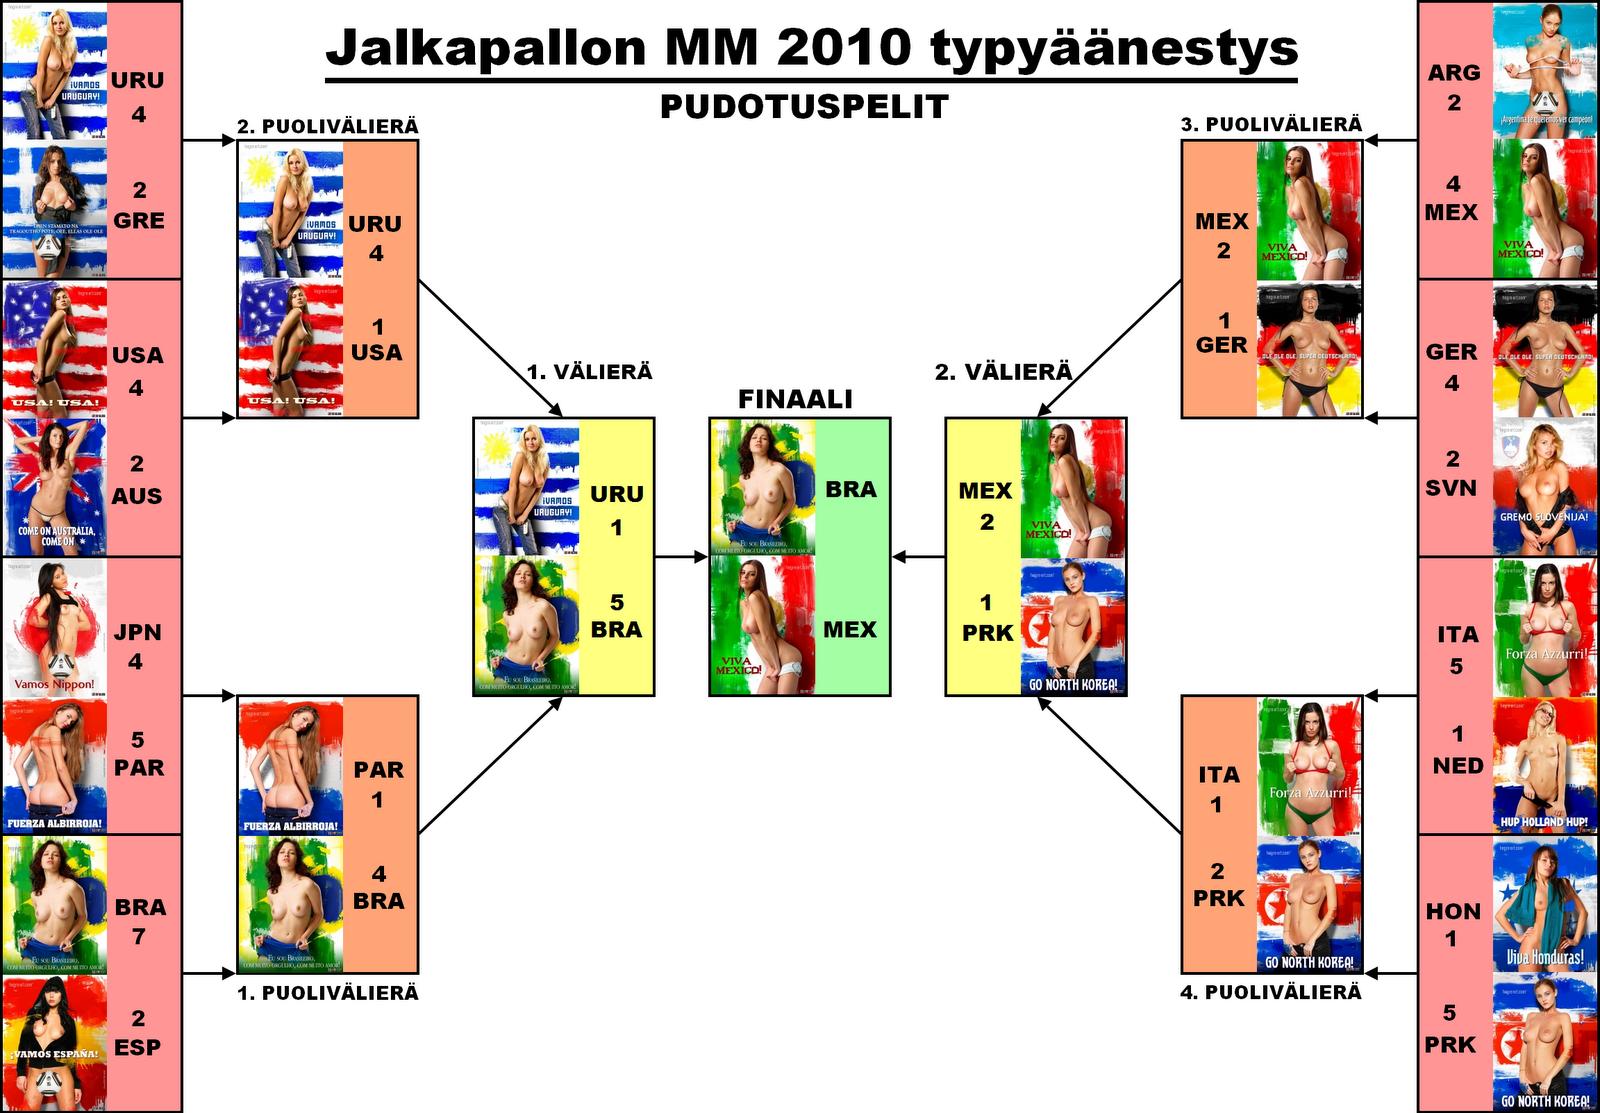 Jalkapallon Mm 2010